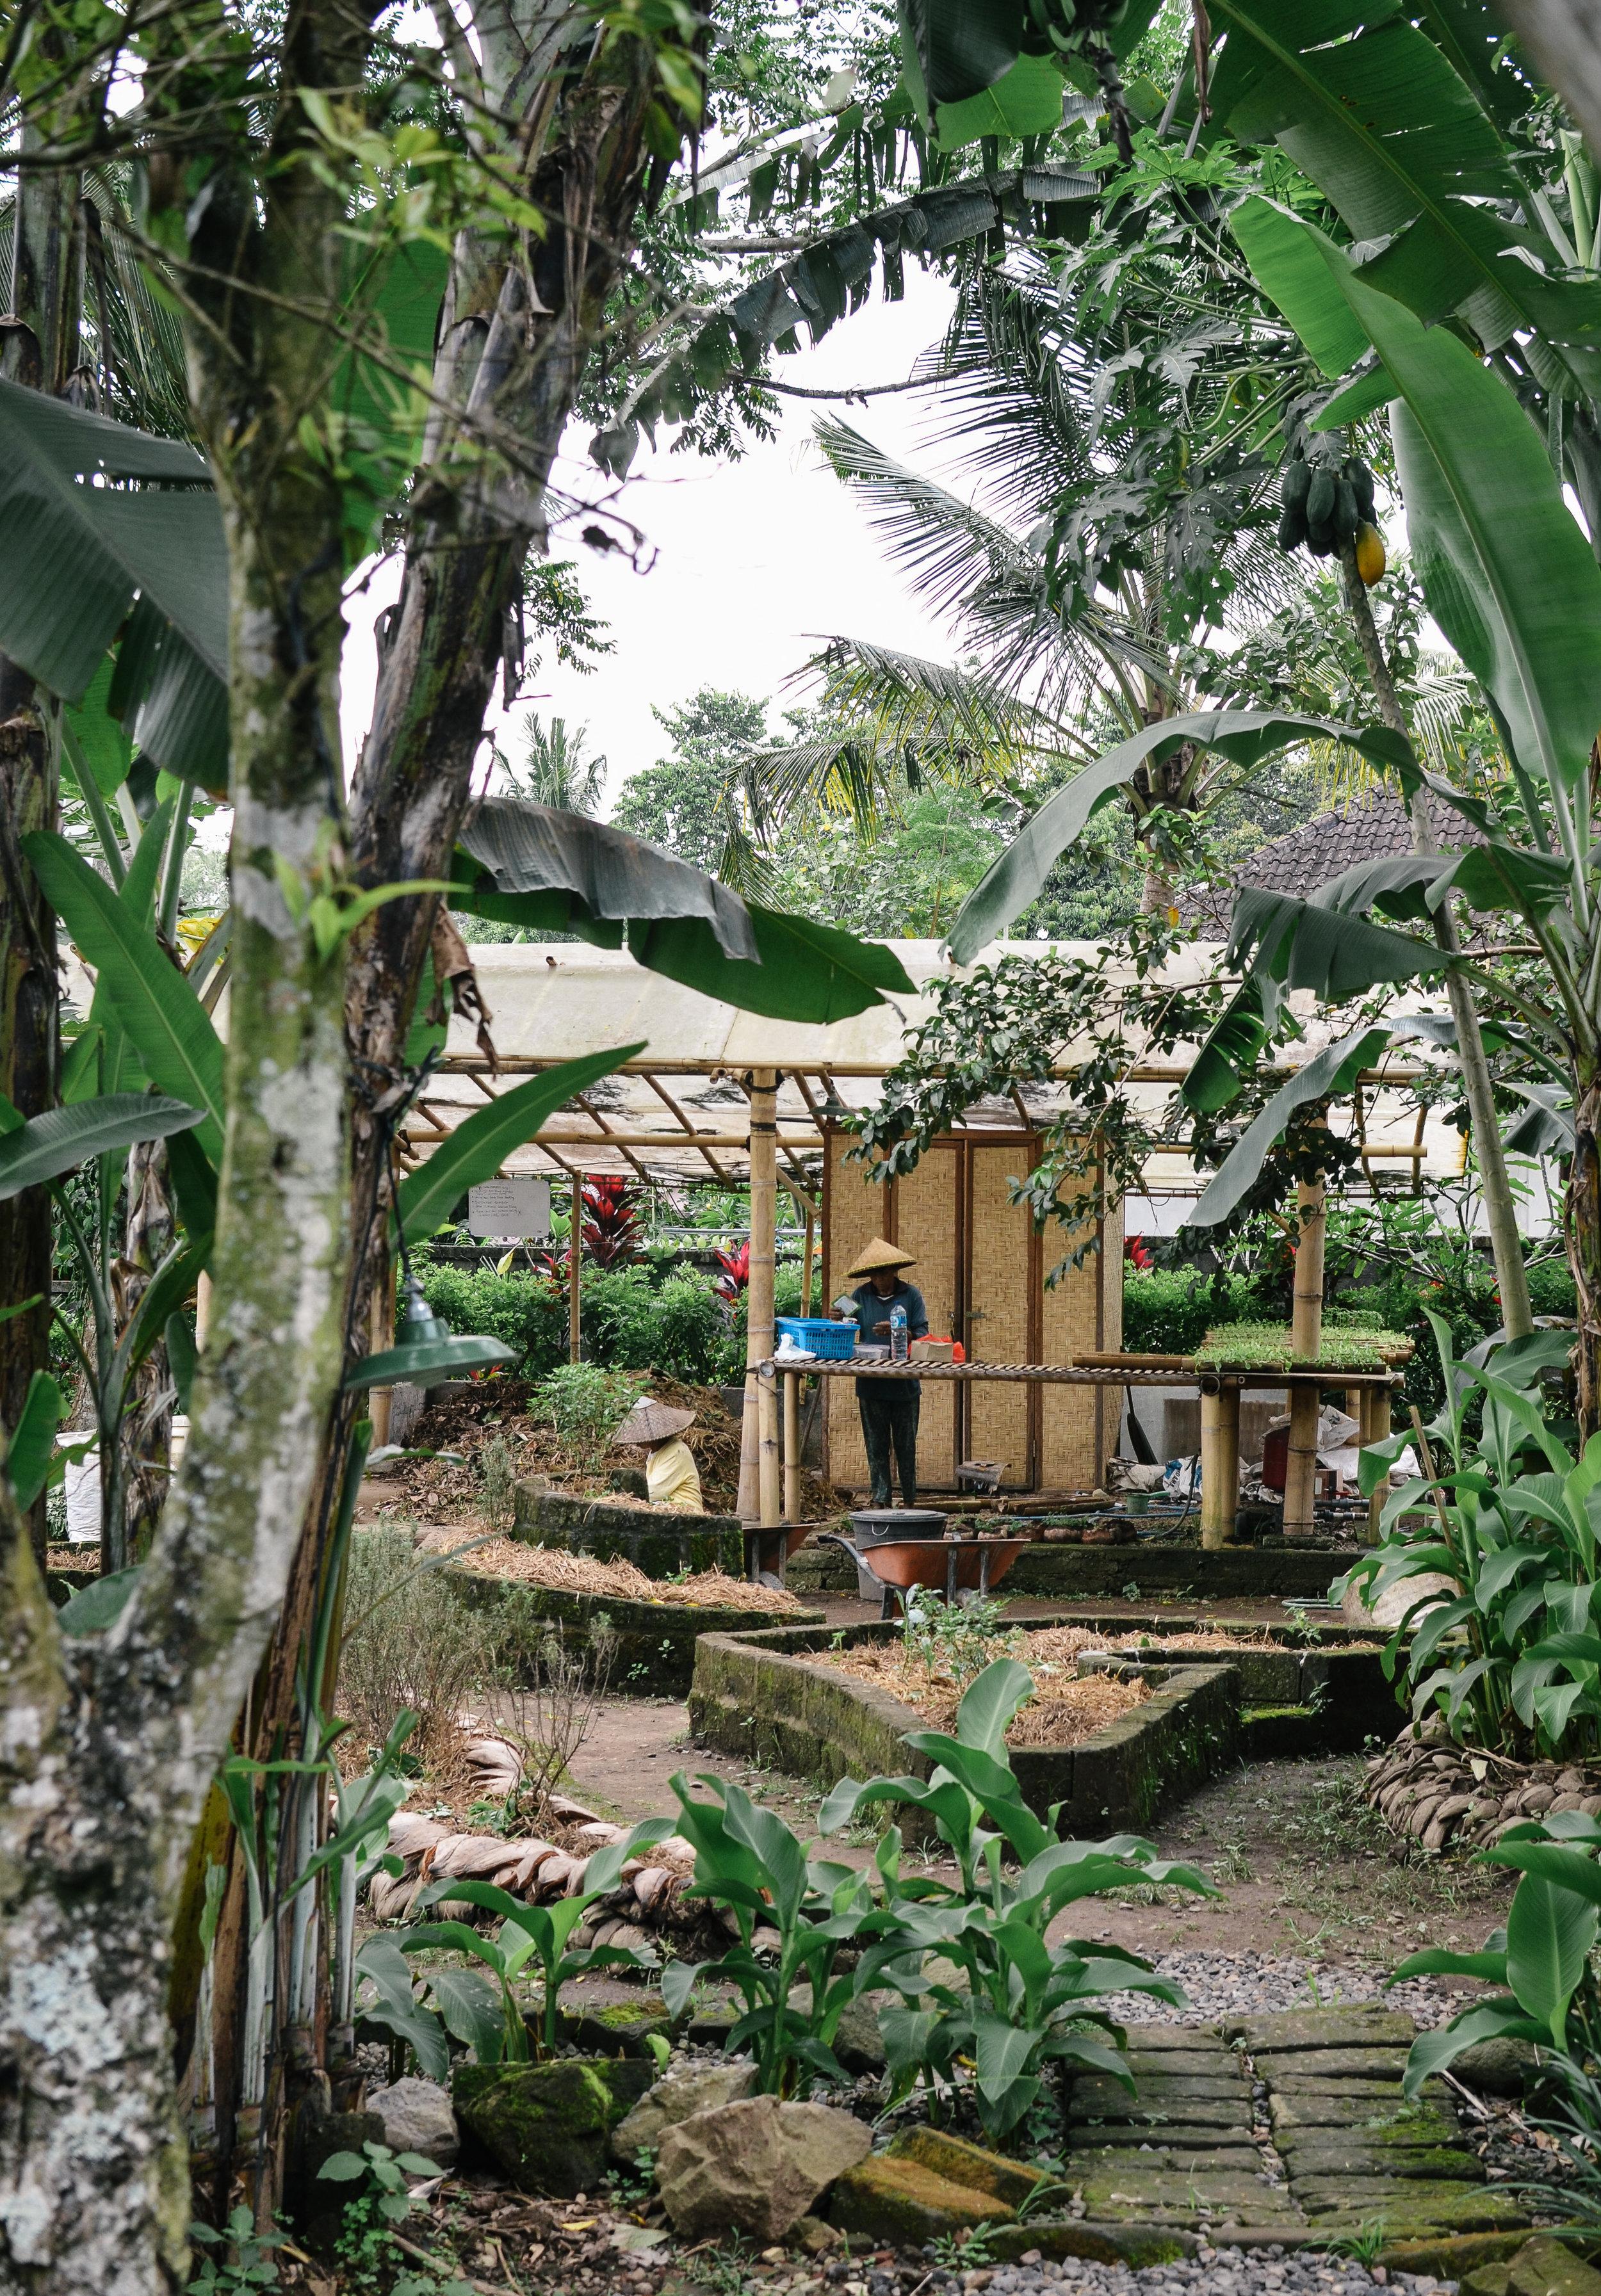 bali+mosca+bamboo+lodge+bali+ubud+lifeonpine_DSC_2741.jpg